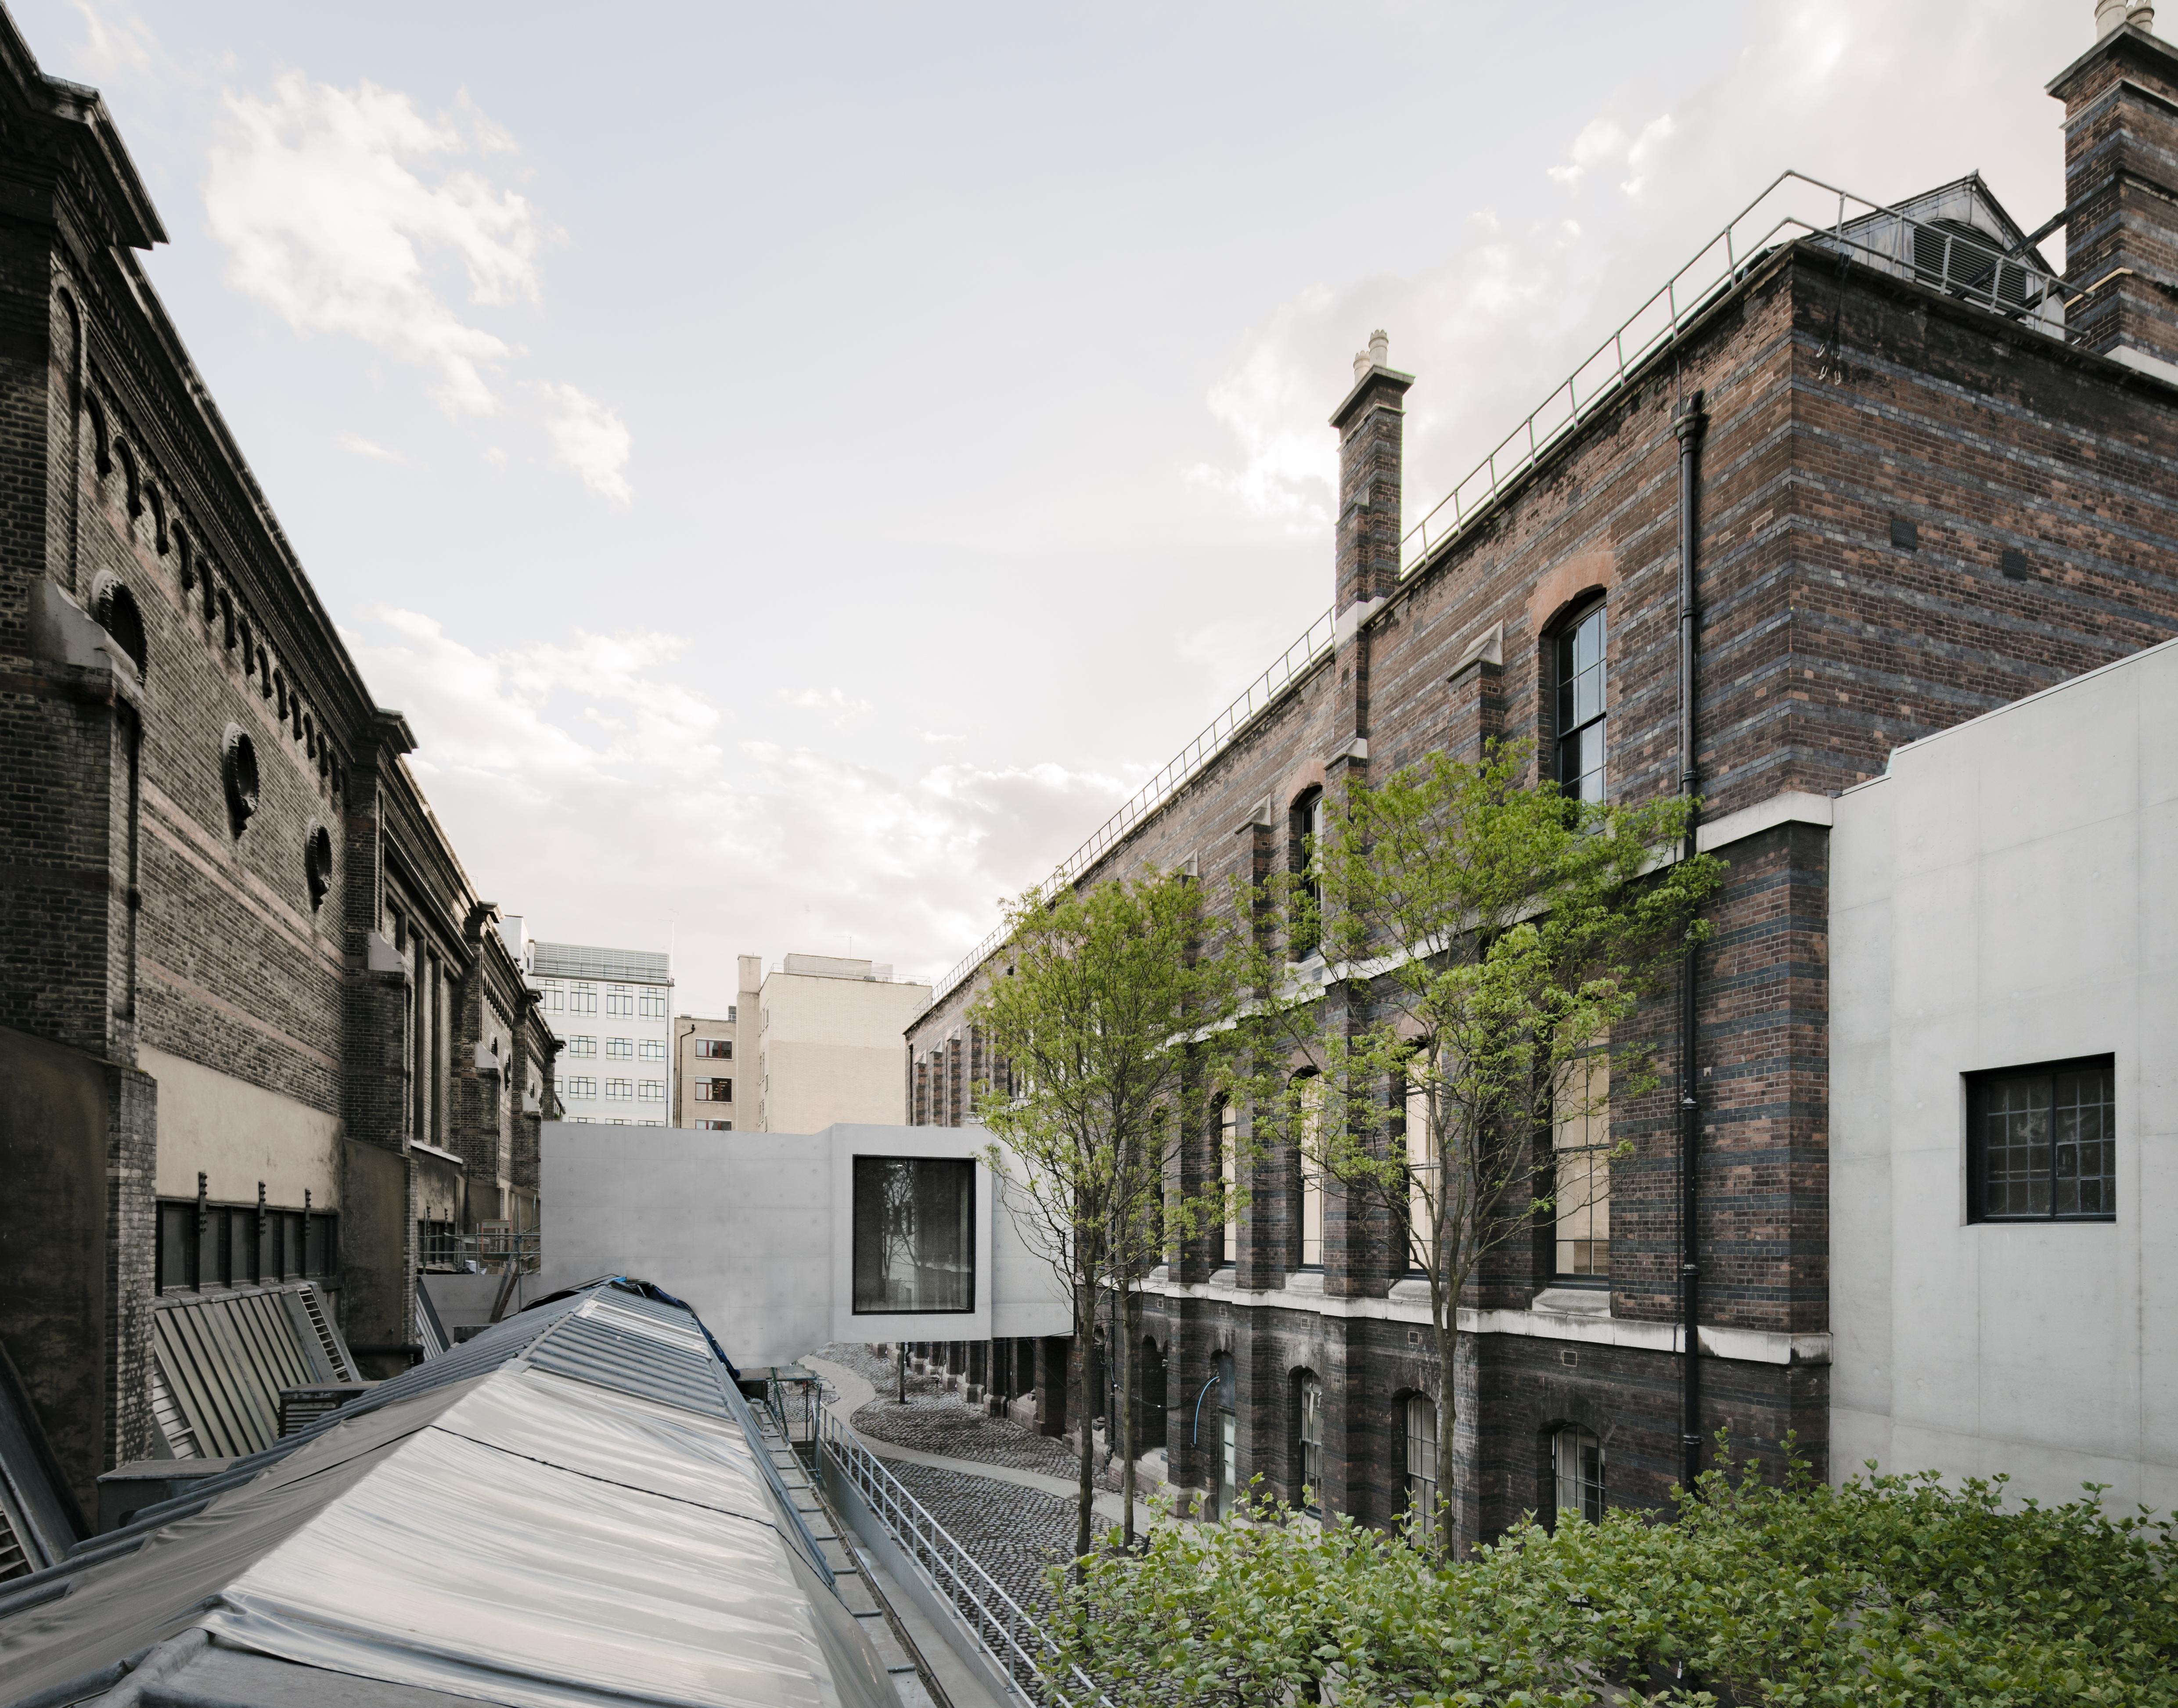 New Royal Academy - Weston Bridge and The Lovelace Courtyard